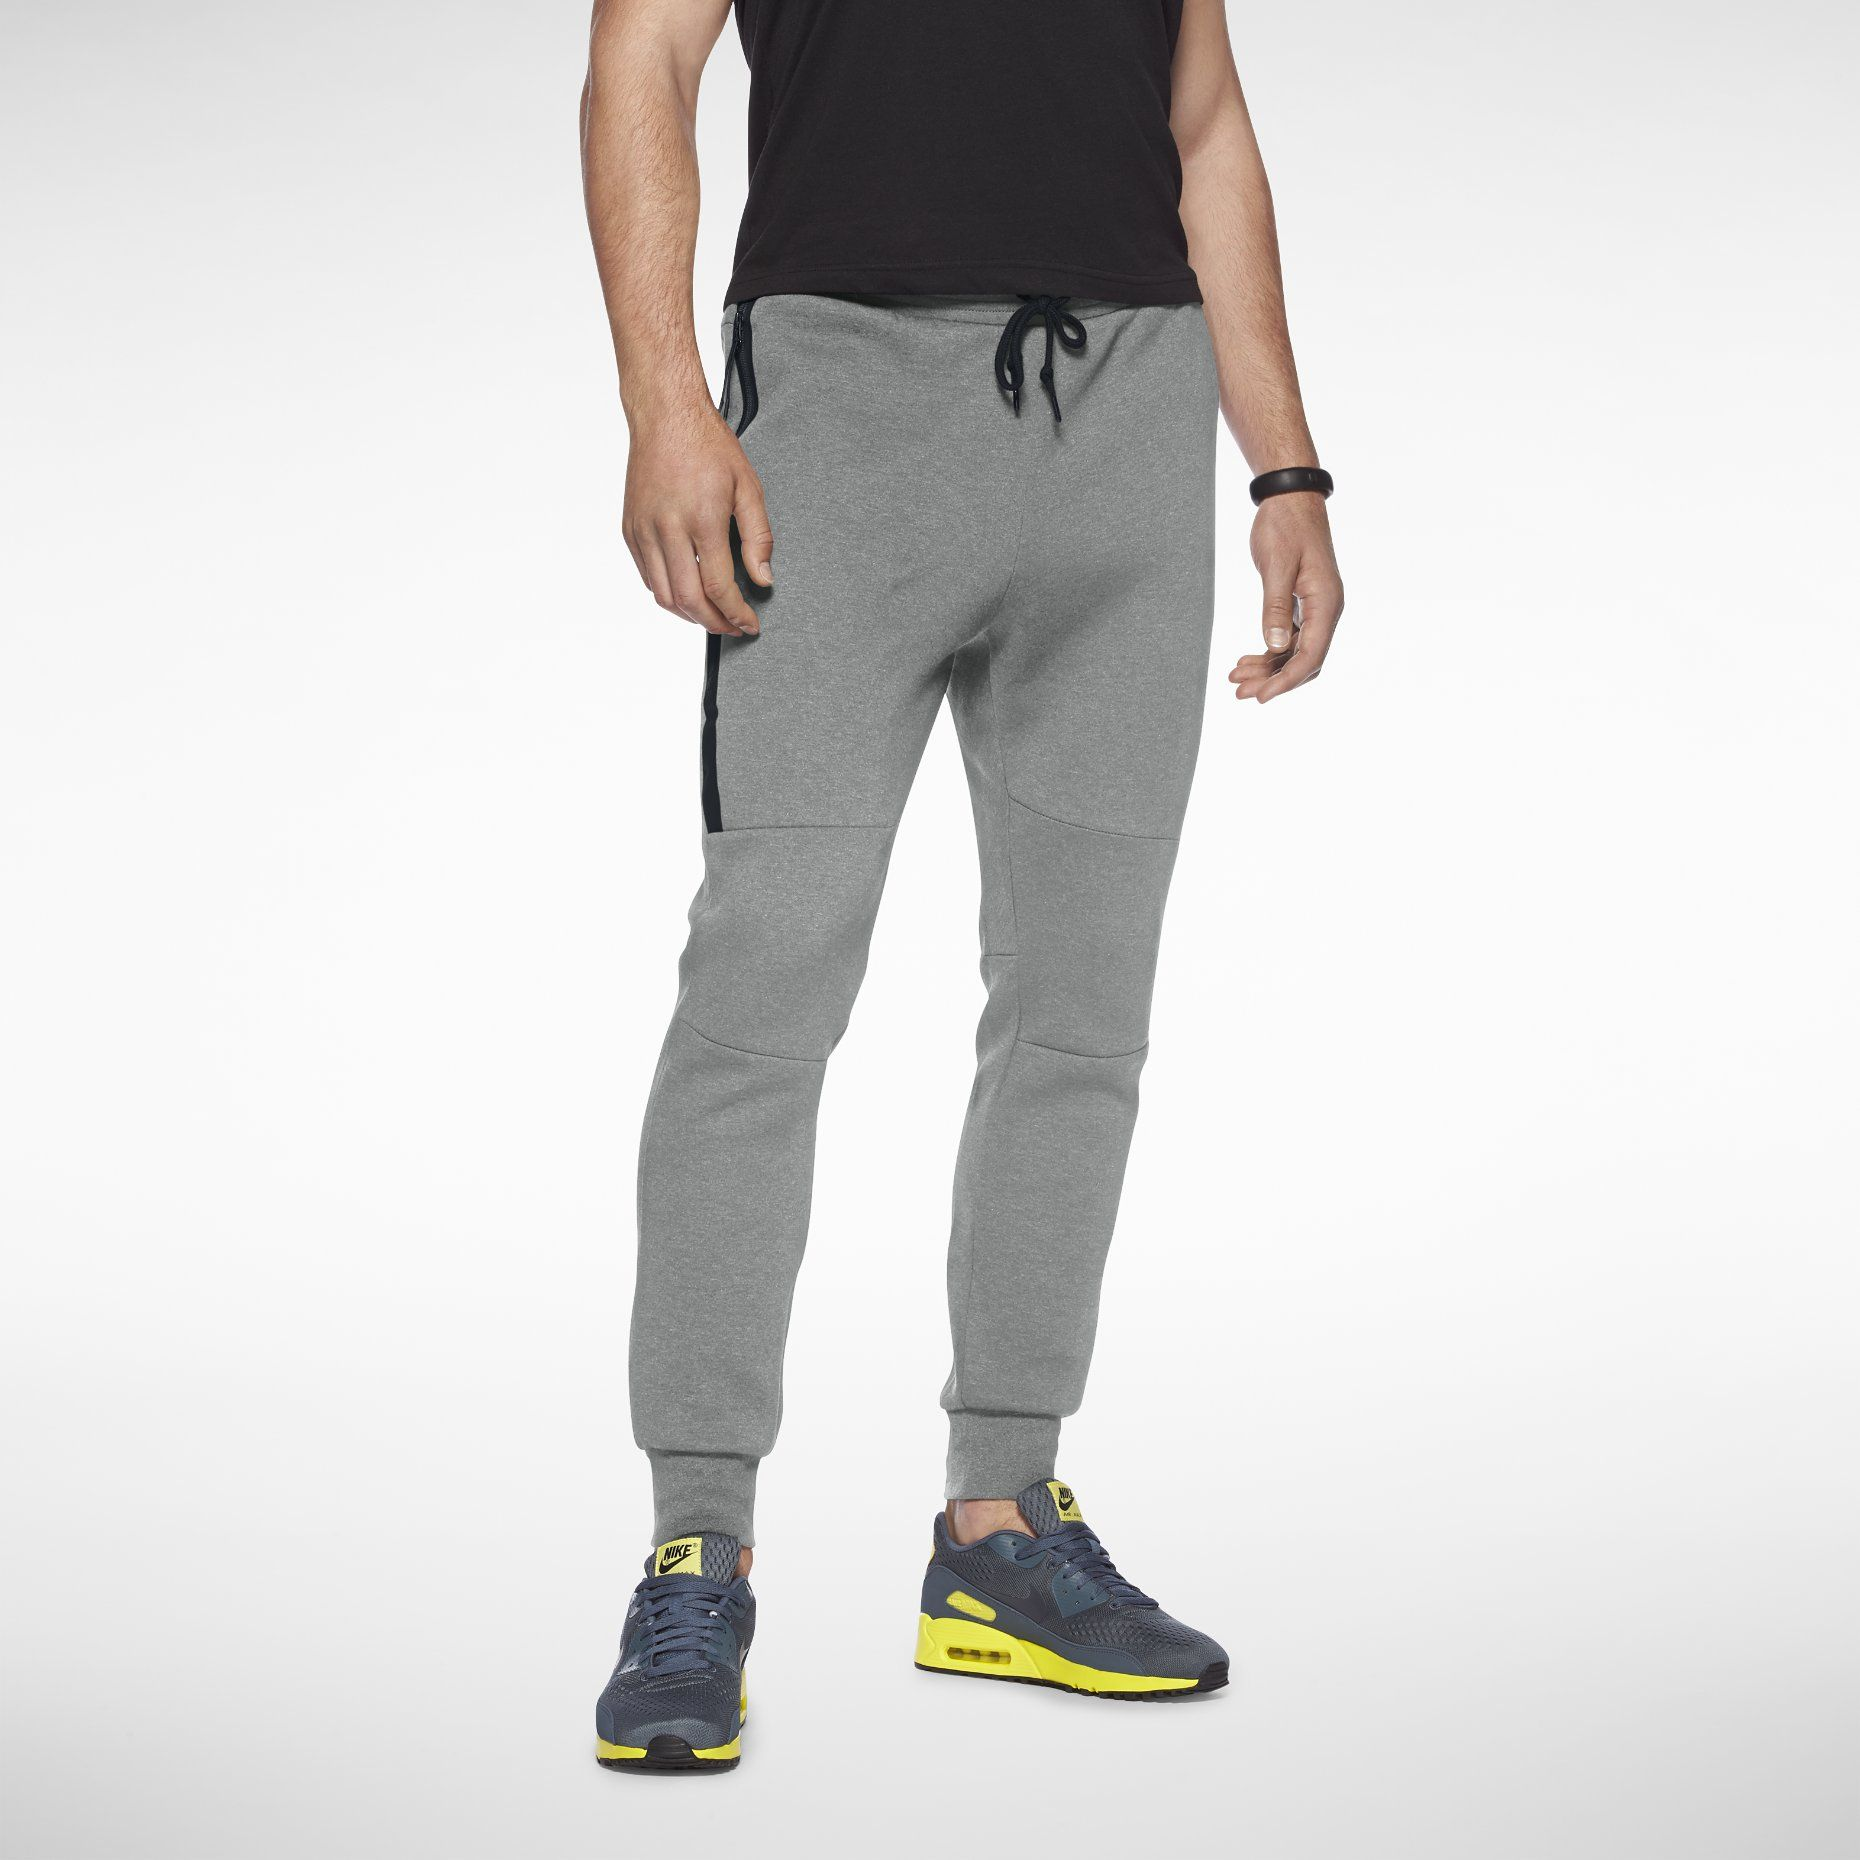 Nike Store. Nike Tech Fleece Men's Pants Nike tech